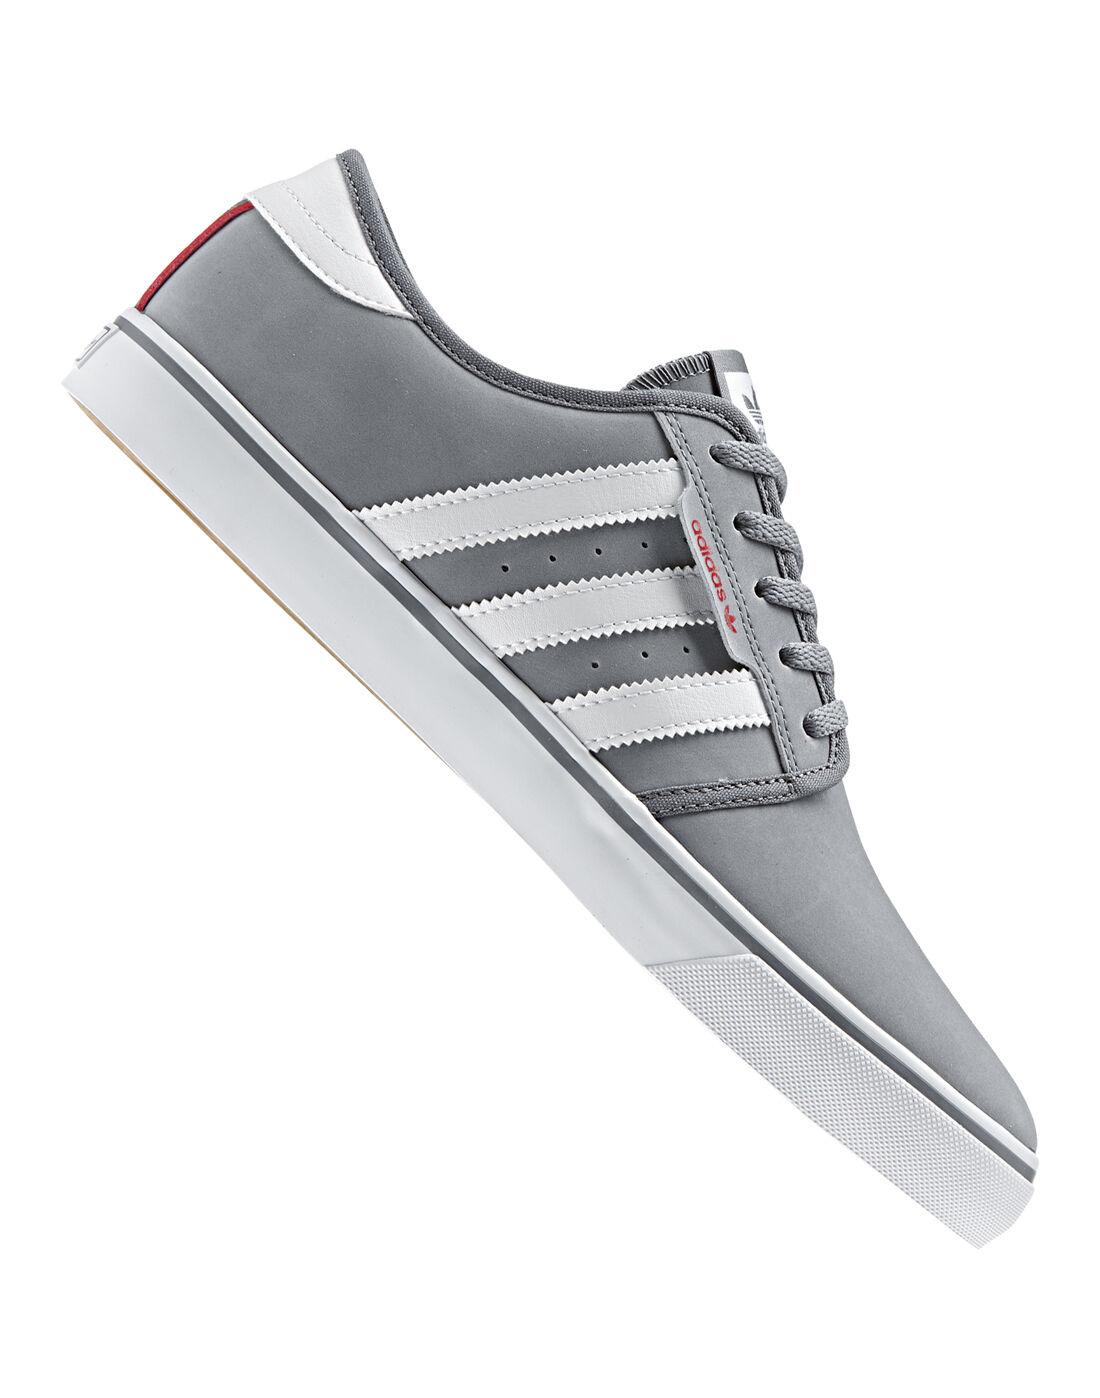 official store adidas mens skate shoes 4b4c4 1f49b